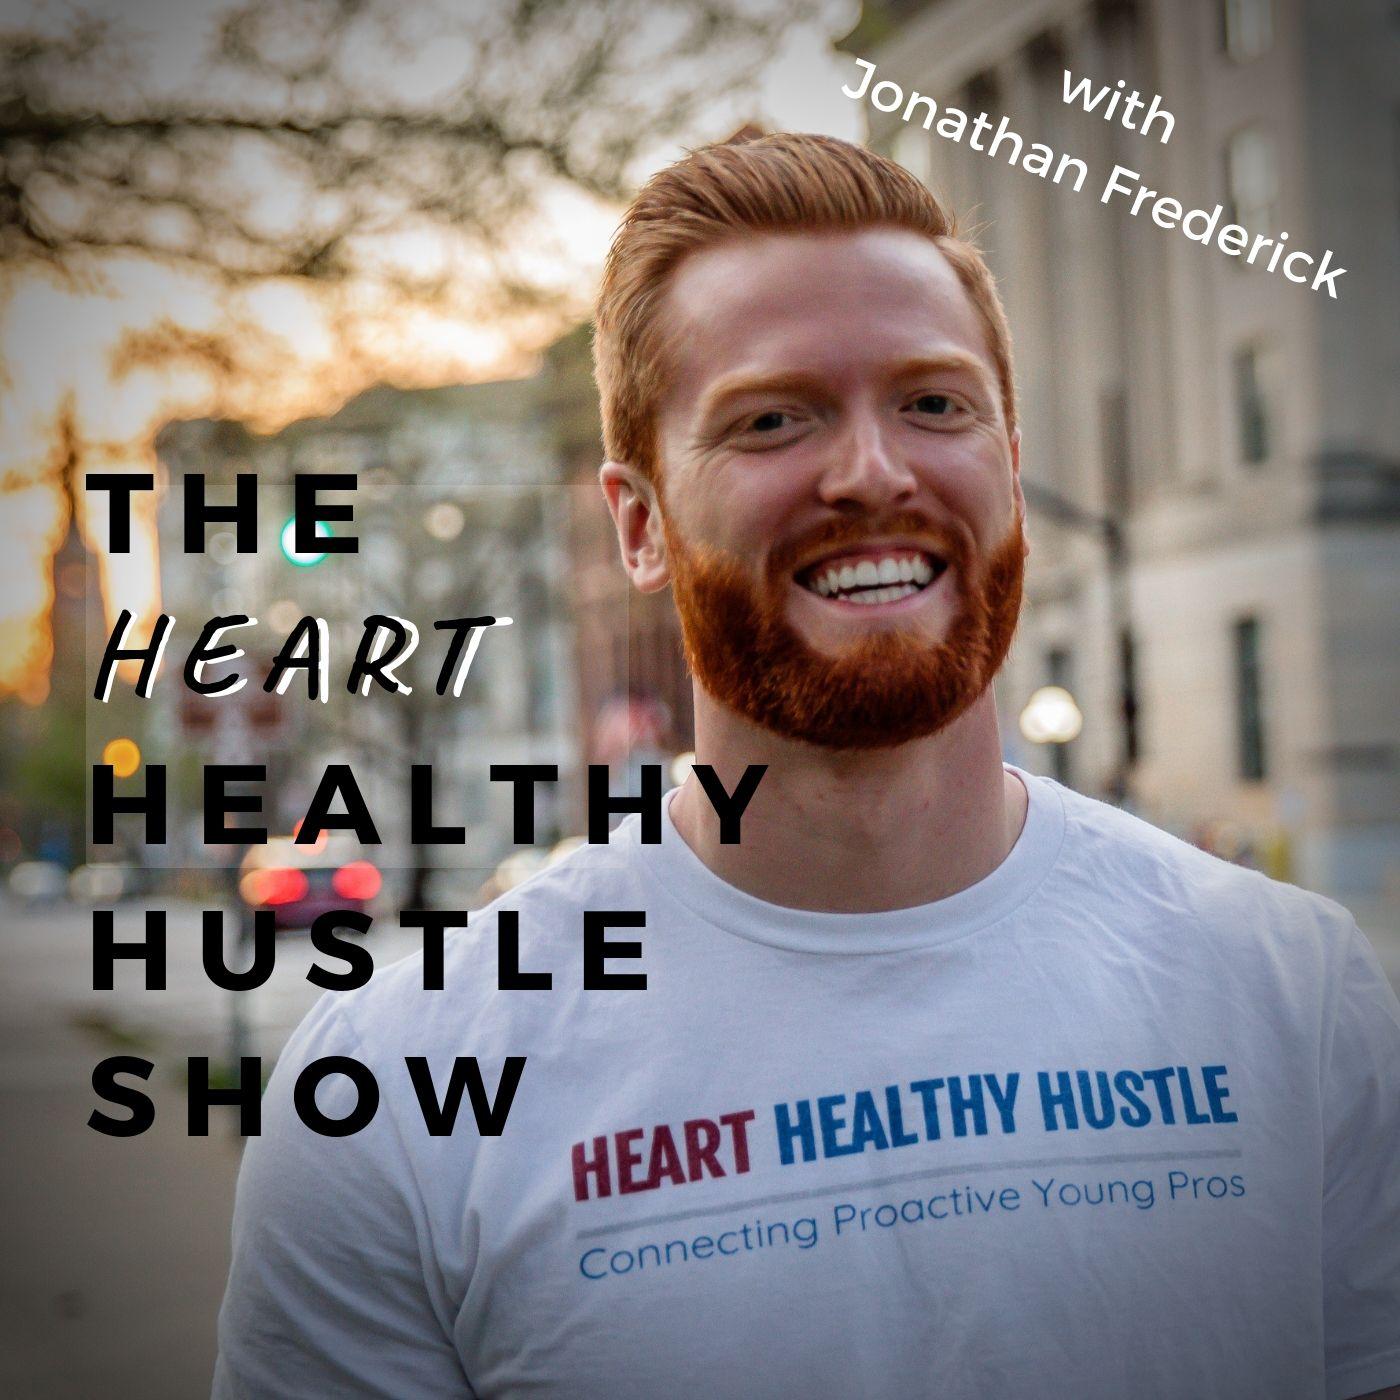 The Heart Healthy Hustle Show show art